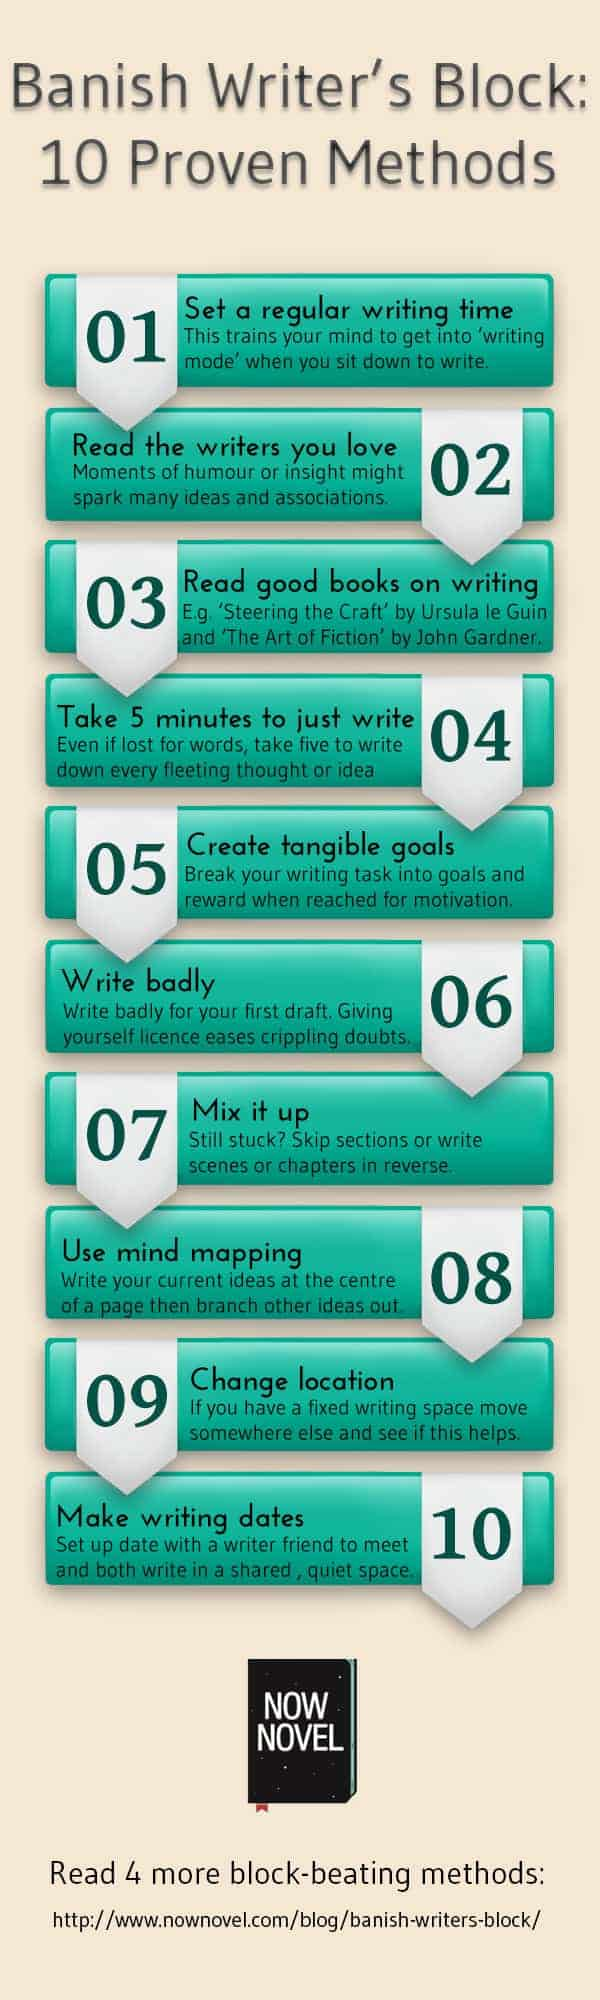 Banish-writers-block-10-proven-methods